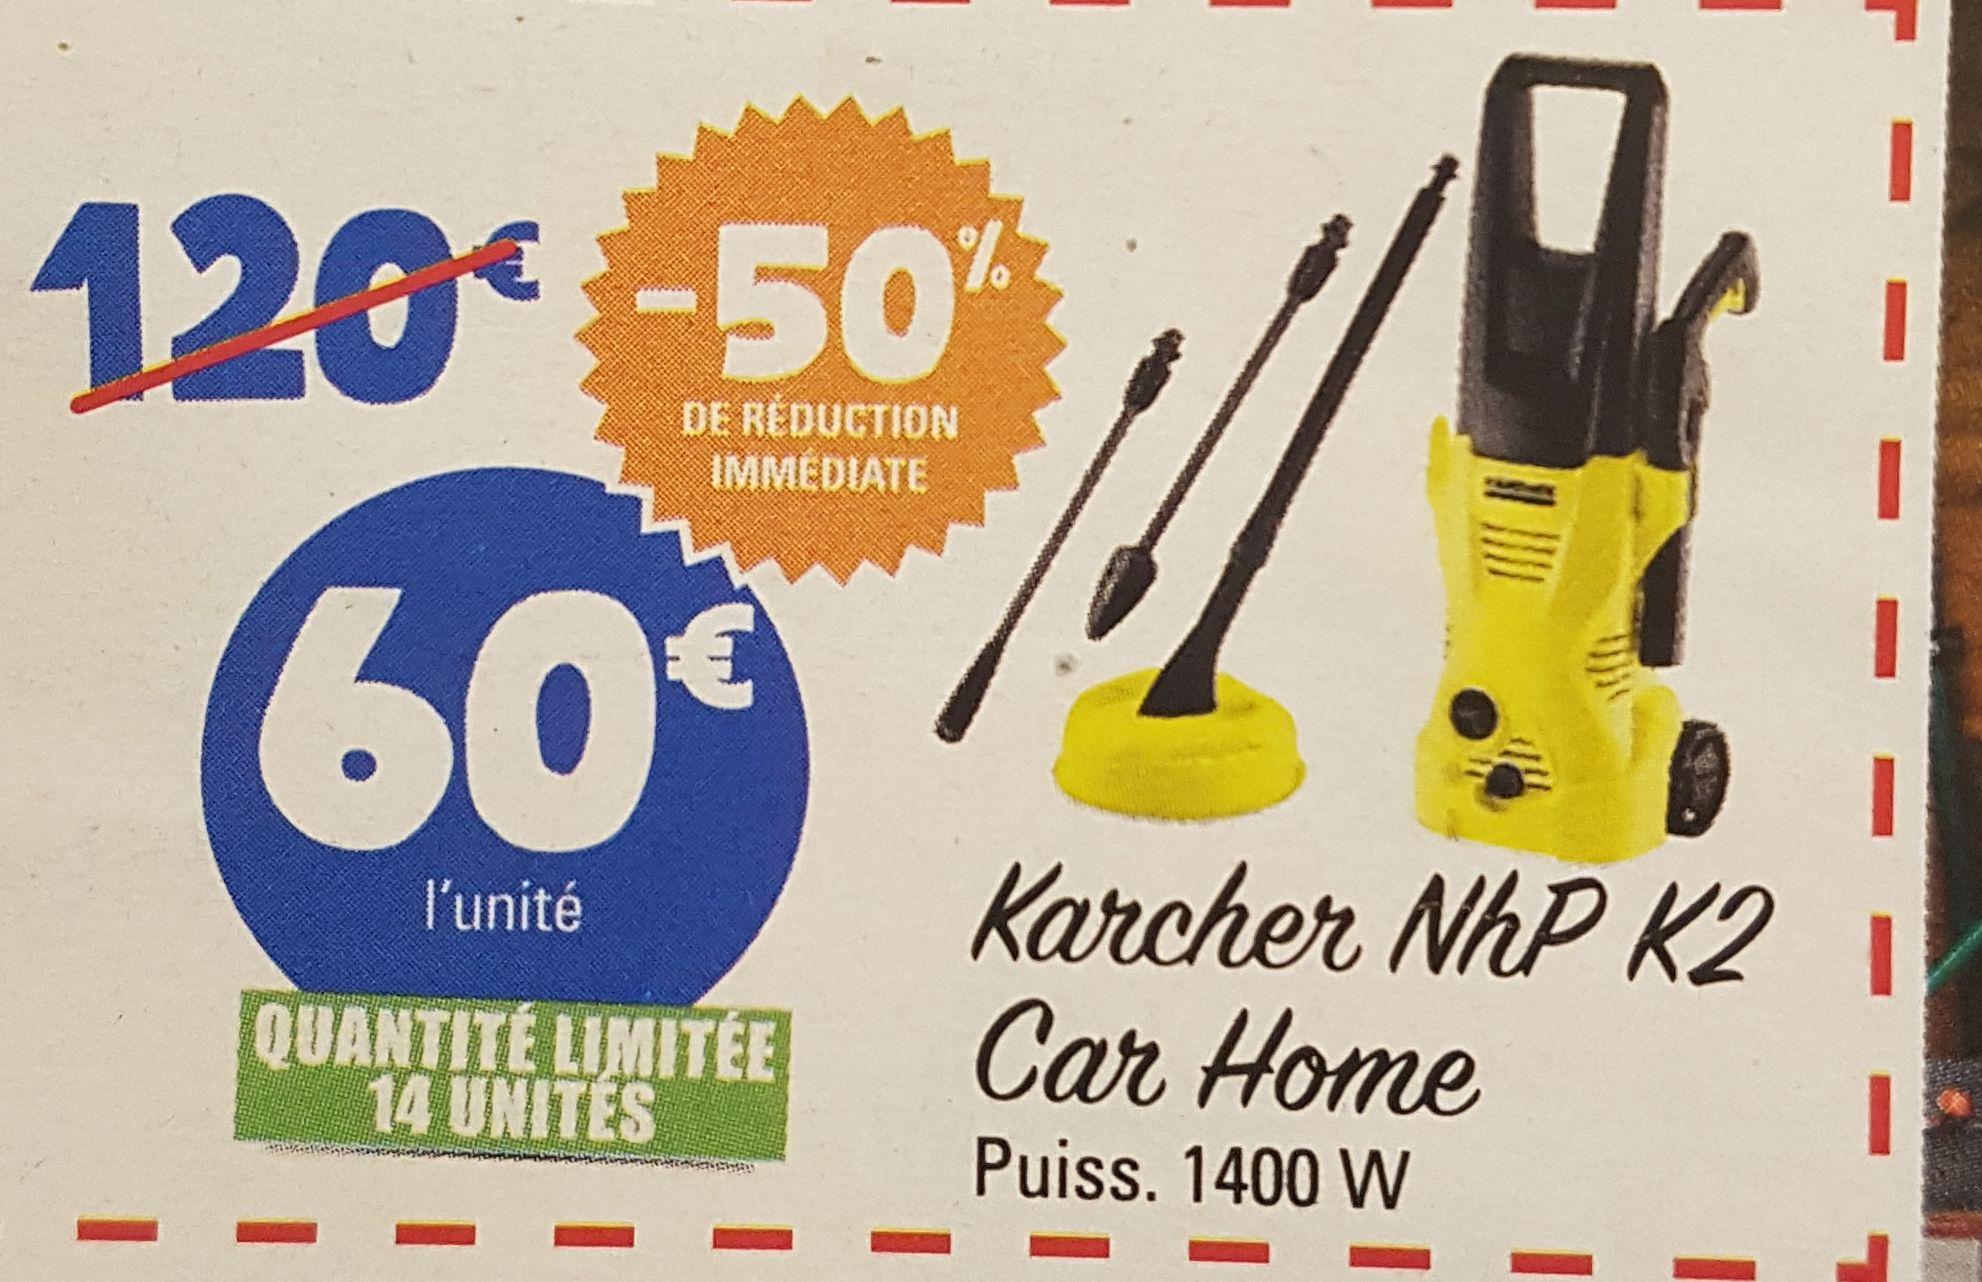 Nettoyeur Haute Pressions Karcher NhP K2 car and home - Seclin (59)